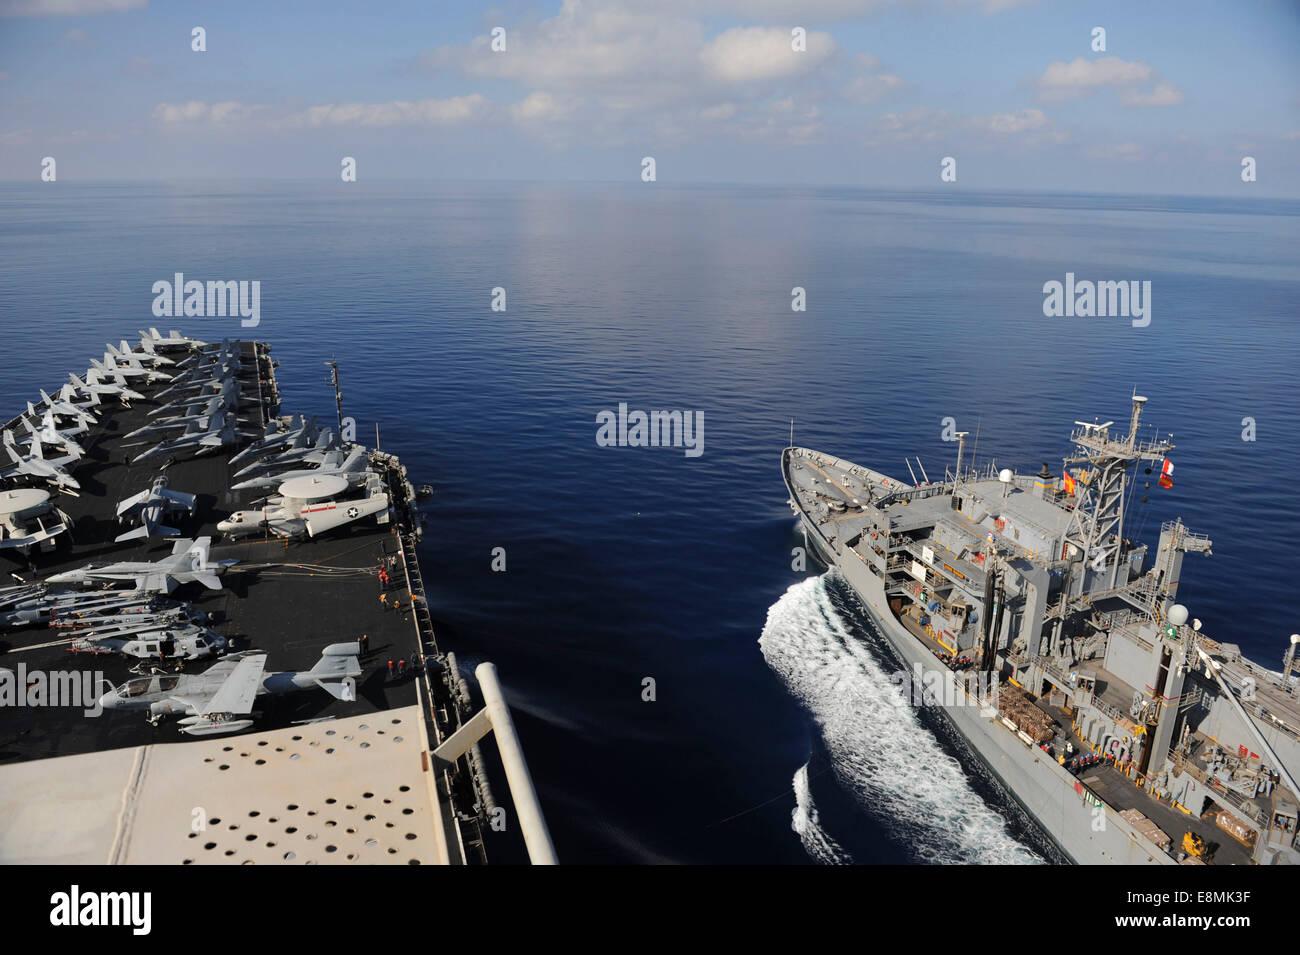 Mediterranean Sea, October 29, 2013 - The Military Sealift Command fast combat support ship USNS Rainier (T-AOE - Stock Image